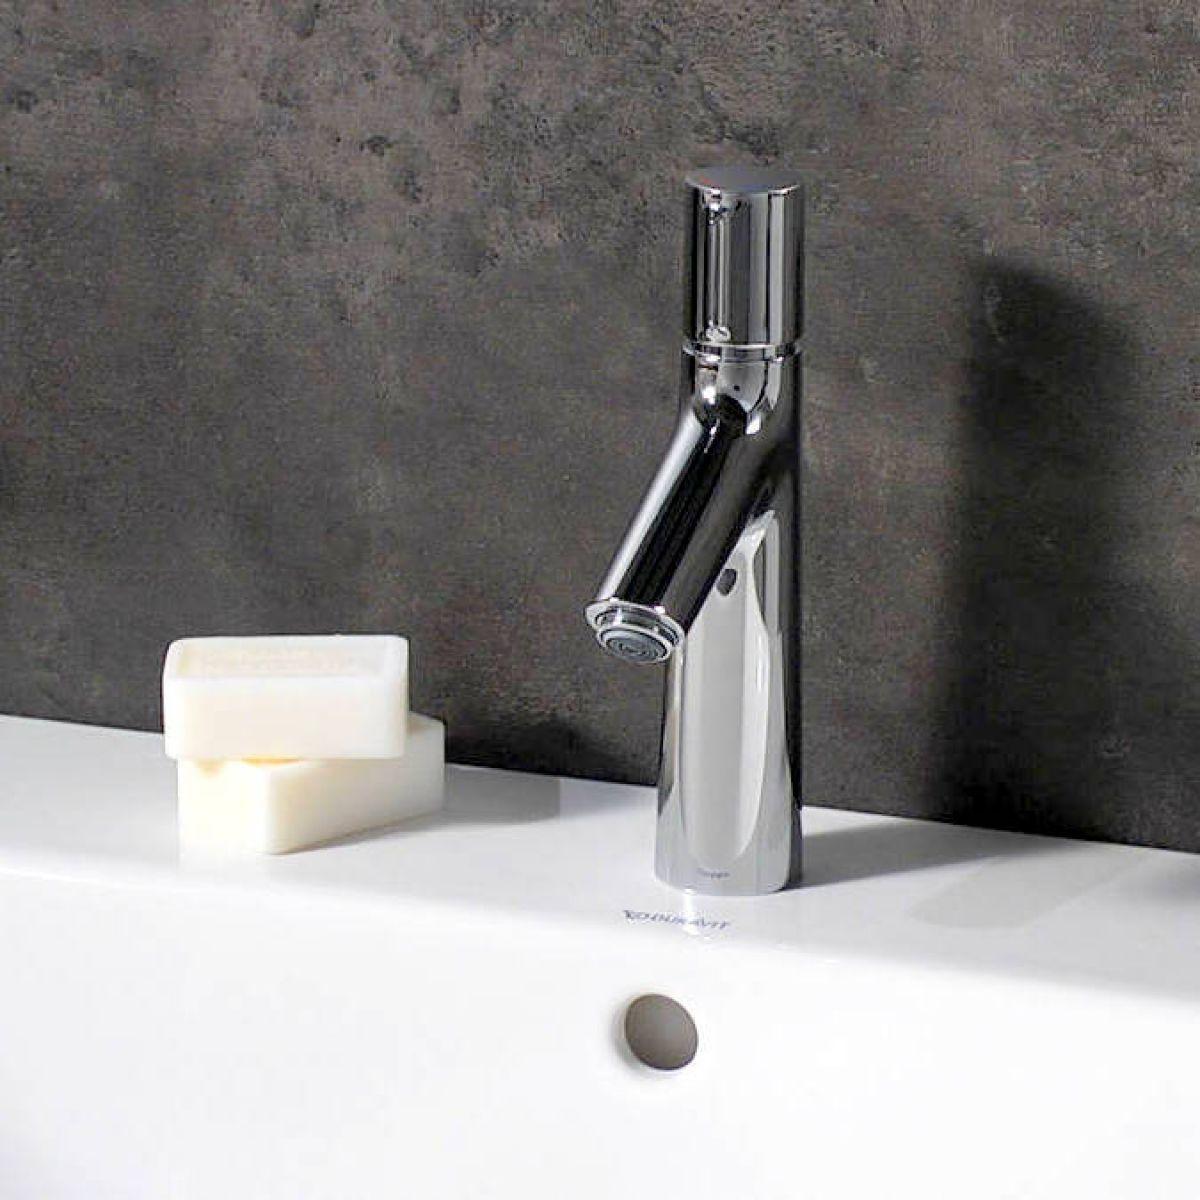 hansgrohe Talis Select S Basin Mixer Tap 100